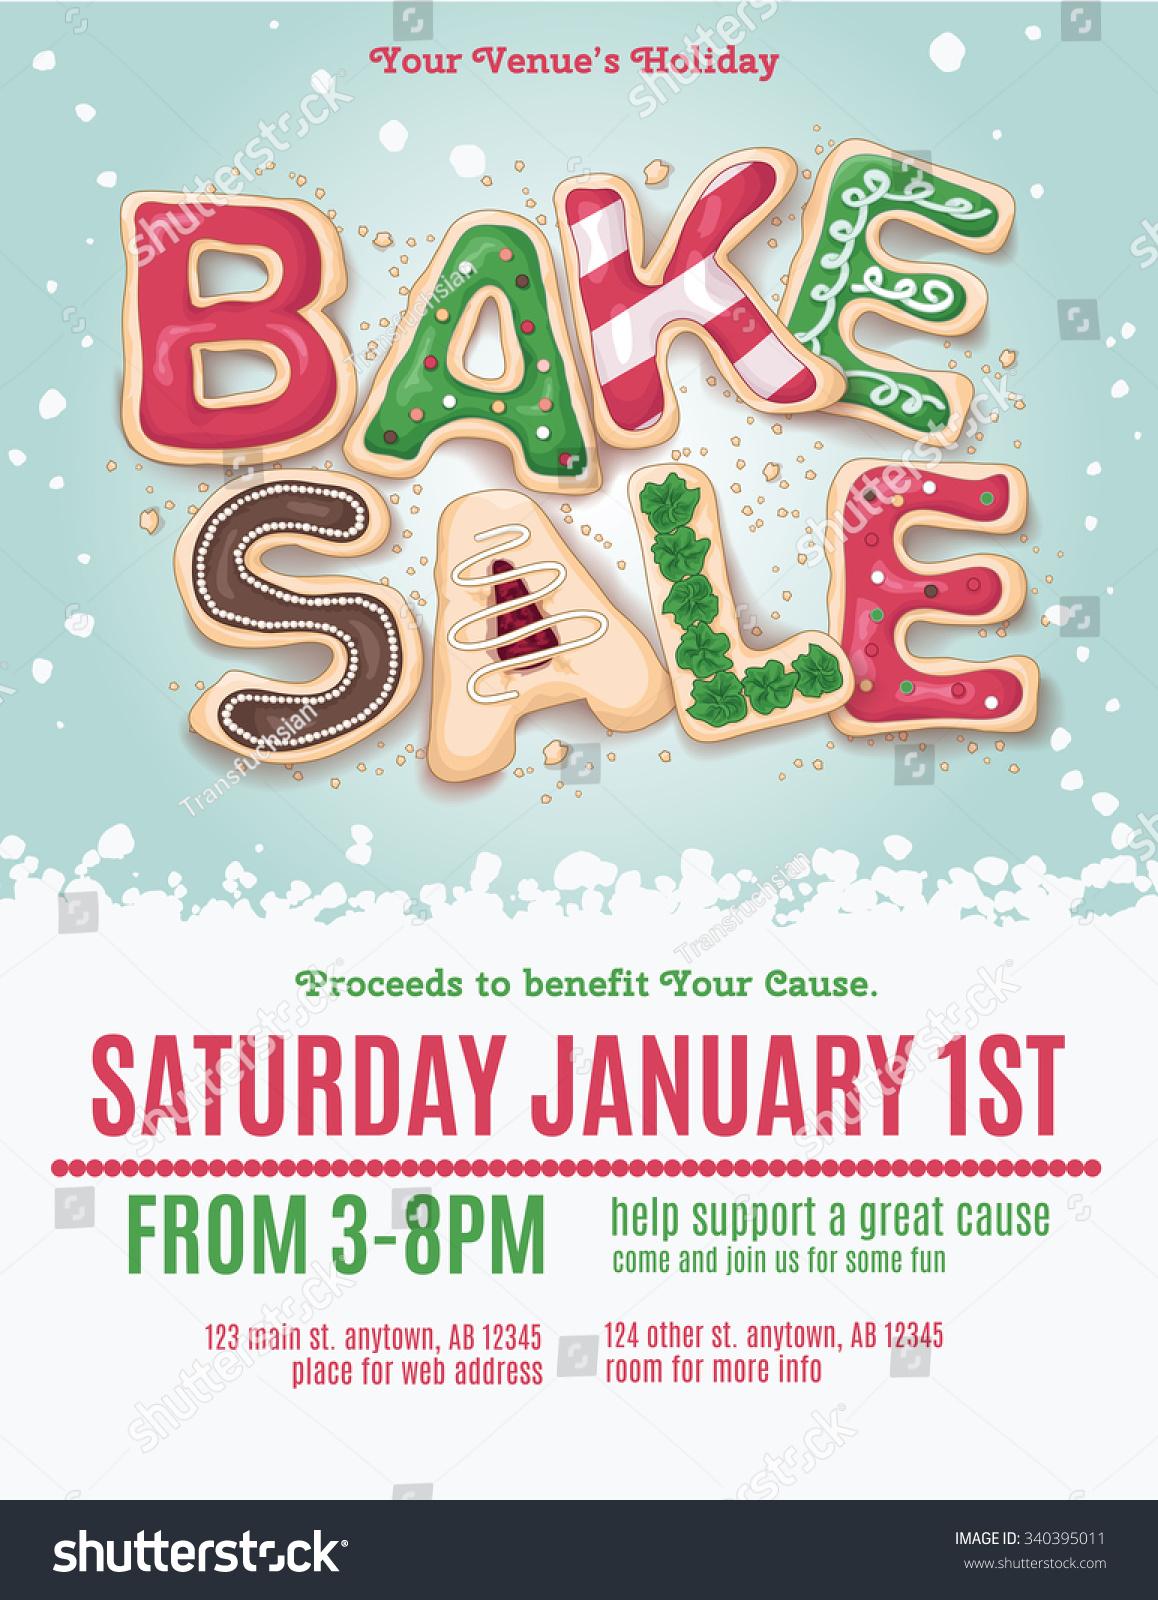 Christmas Holiday Bake Sale Flyer Template Stock Vector